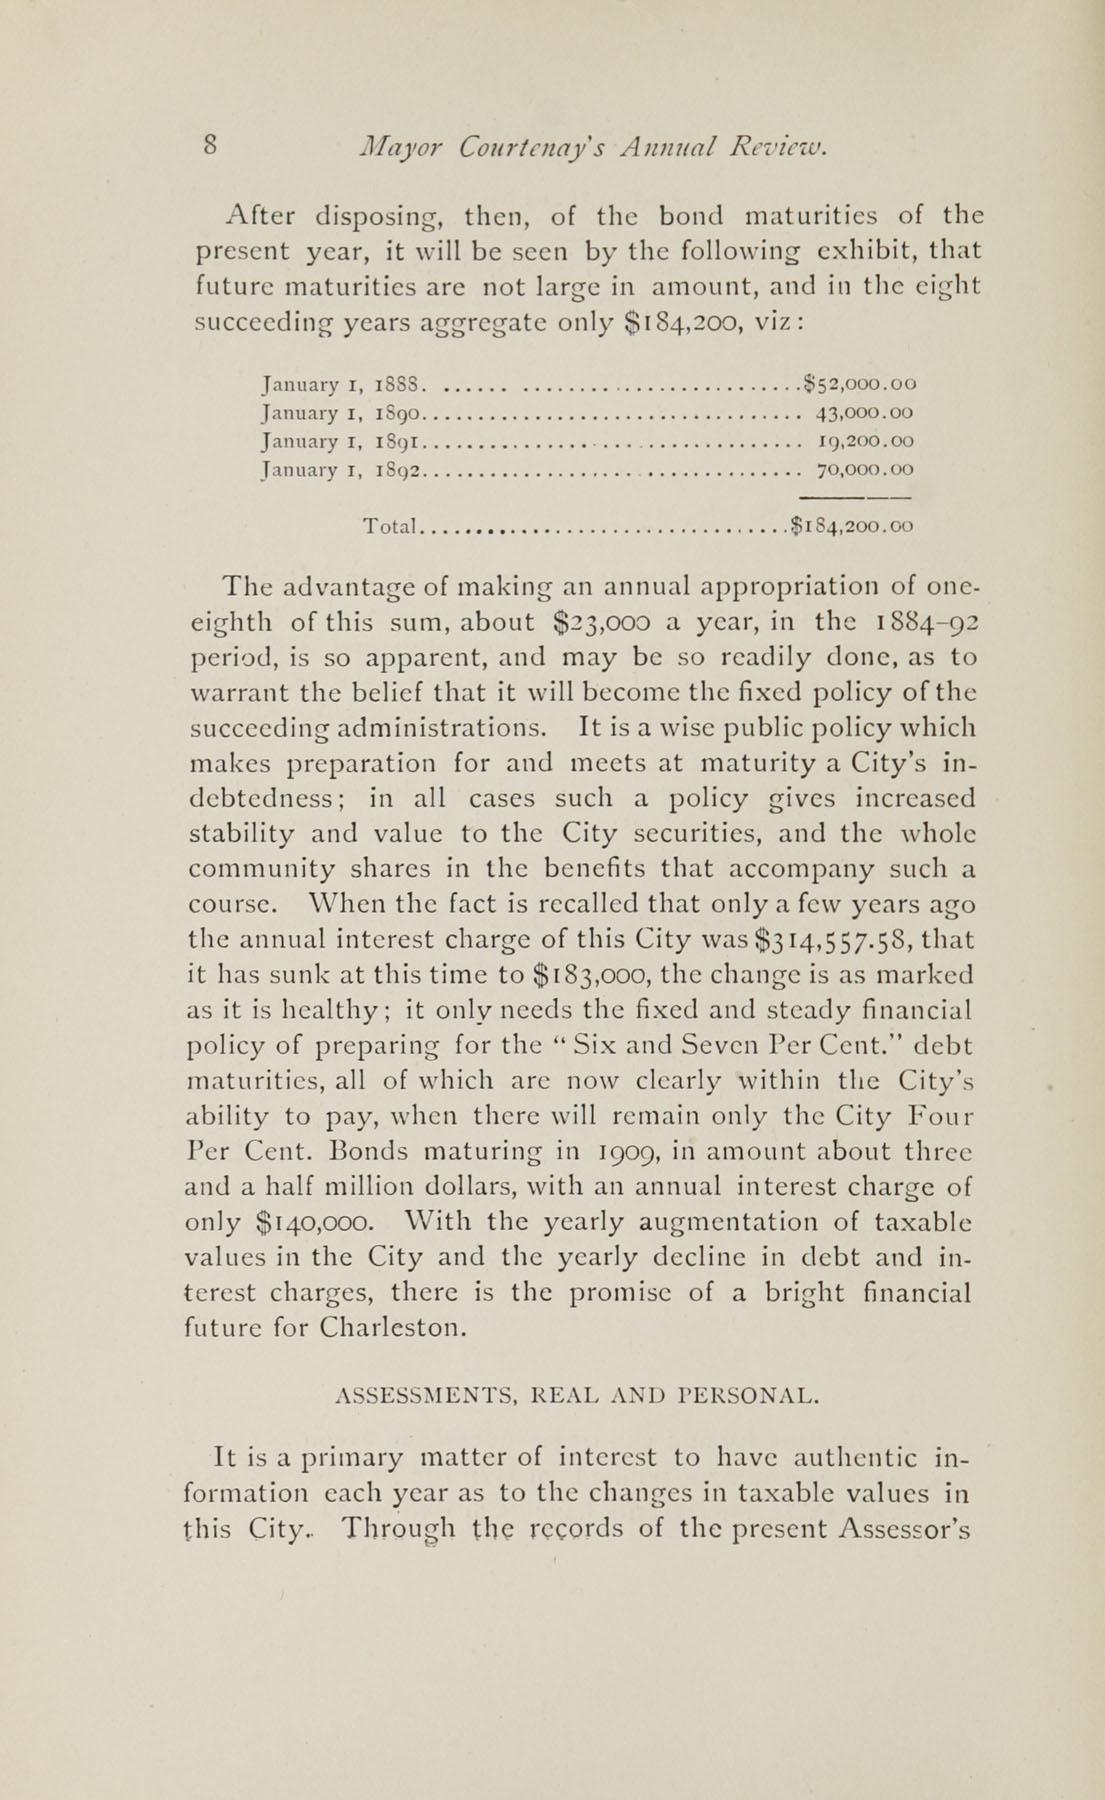 Charleston Yearbook, 1882, page 8